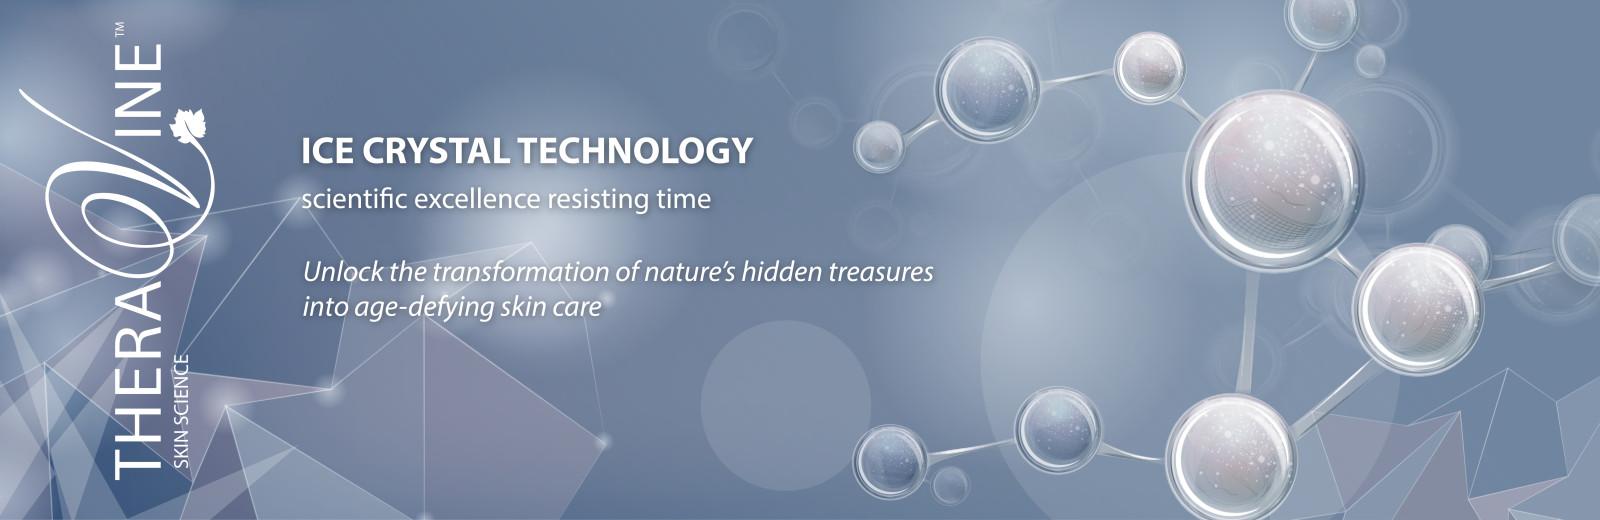 Ice Crystal Technology